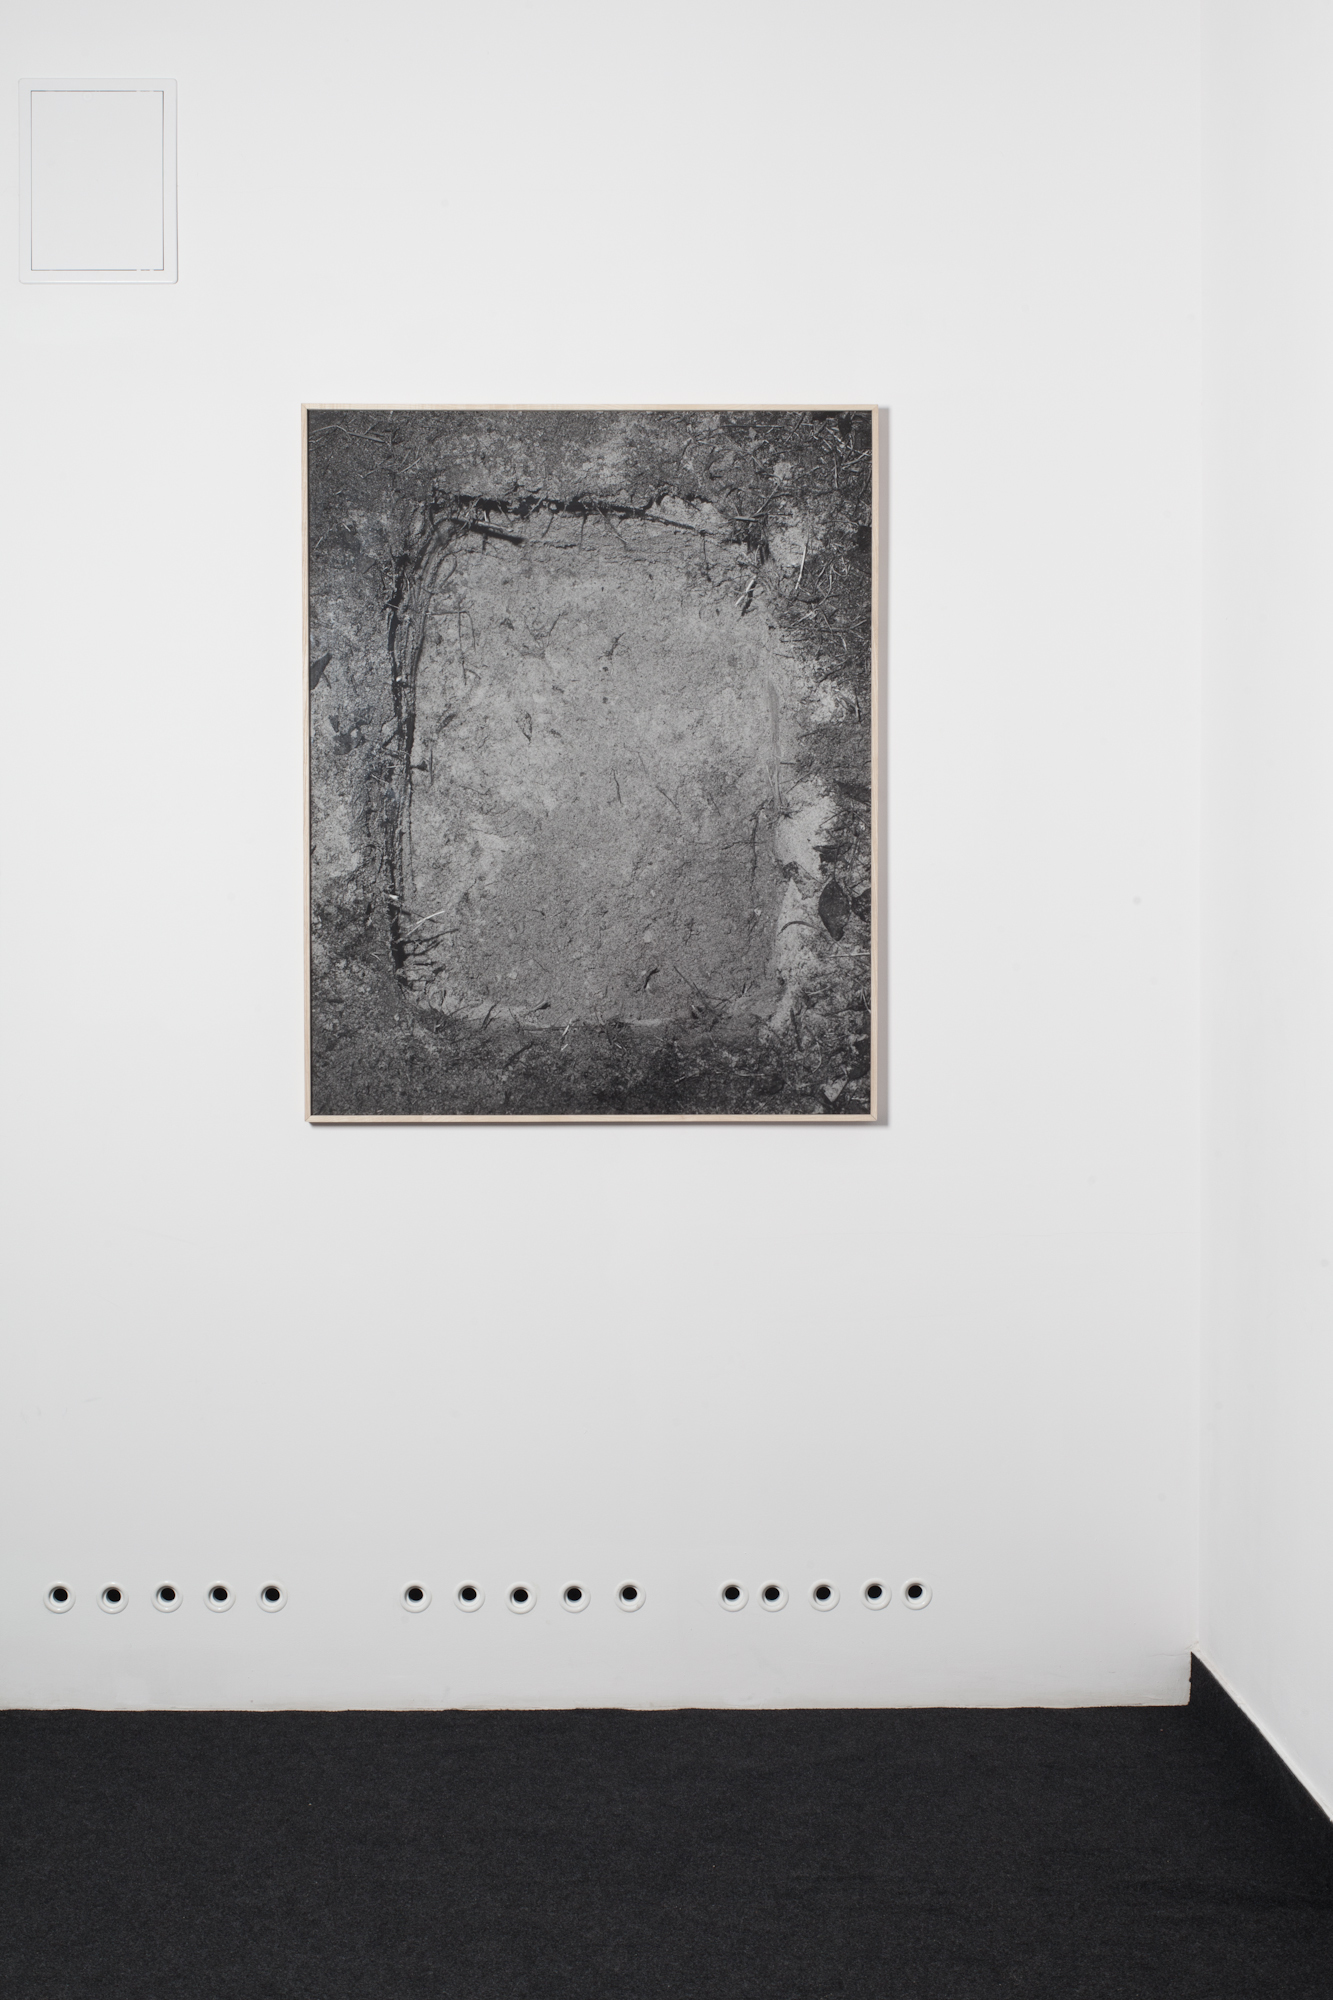 """dziura wziemi"", 2013-14, 120x96 cm"